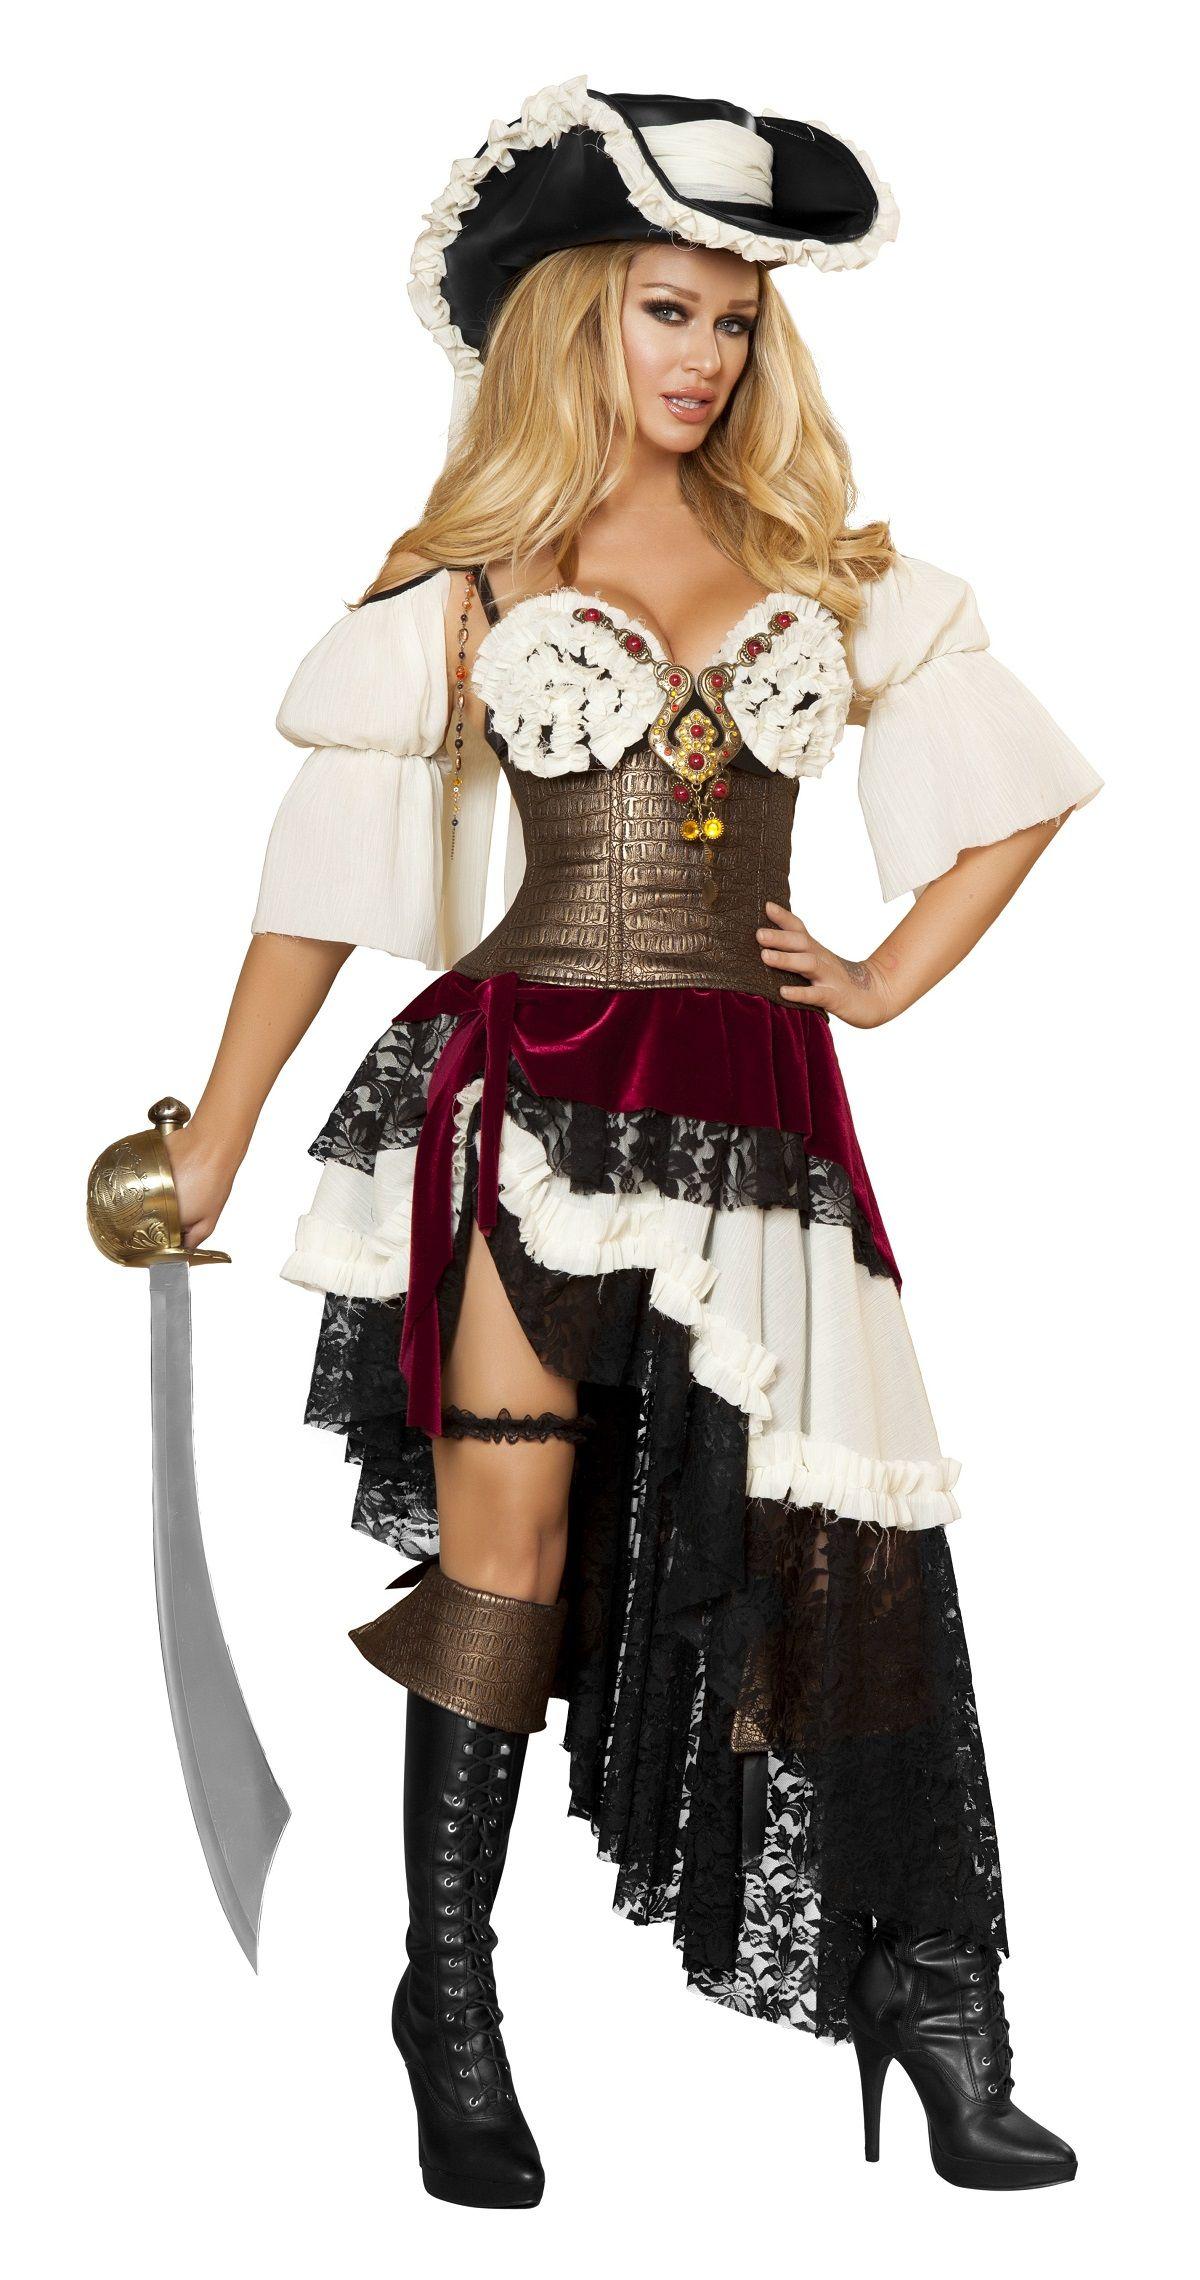 Seems Erotic costumes pirate congratulate, this